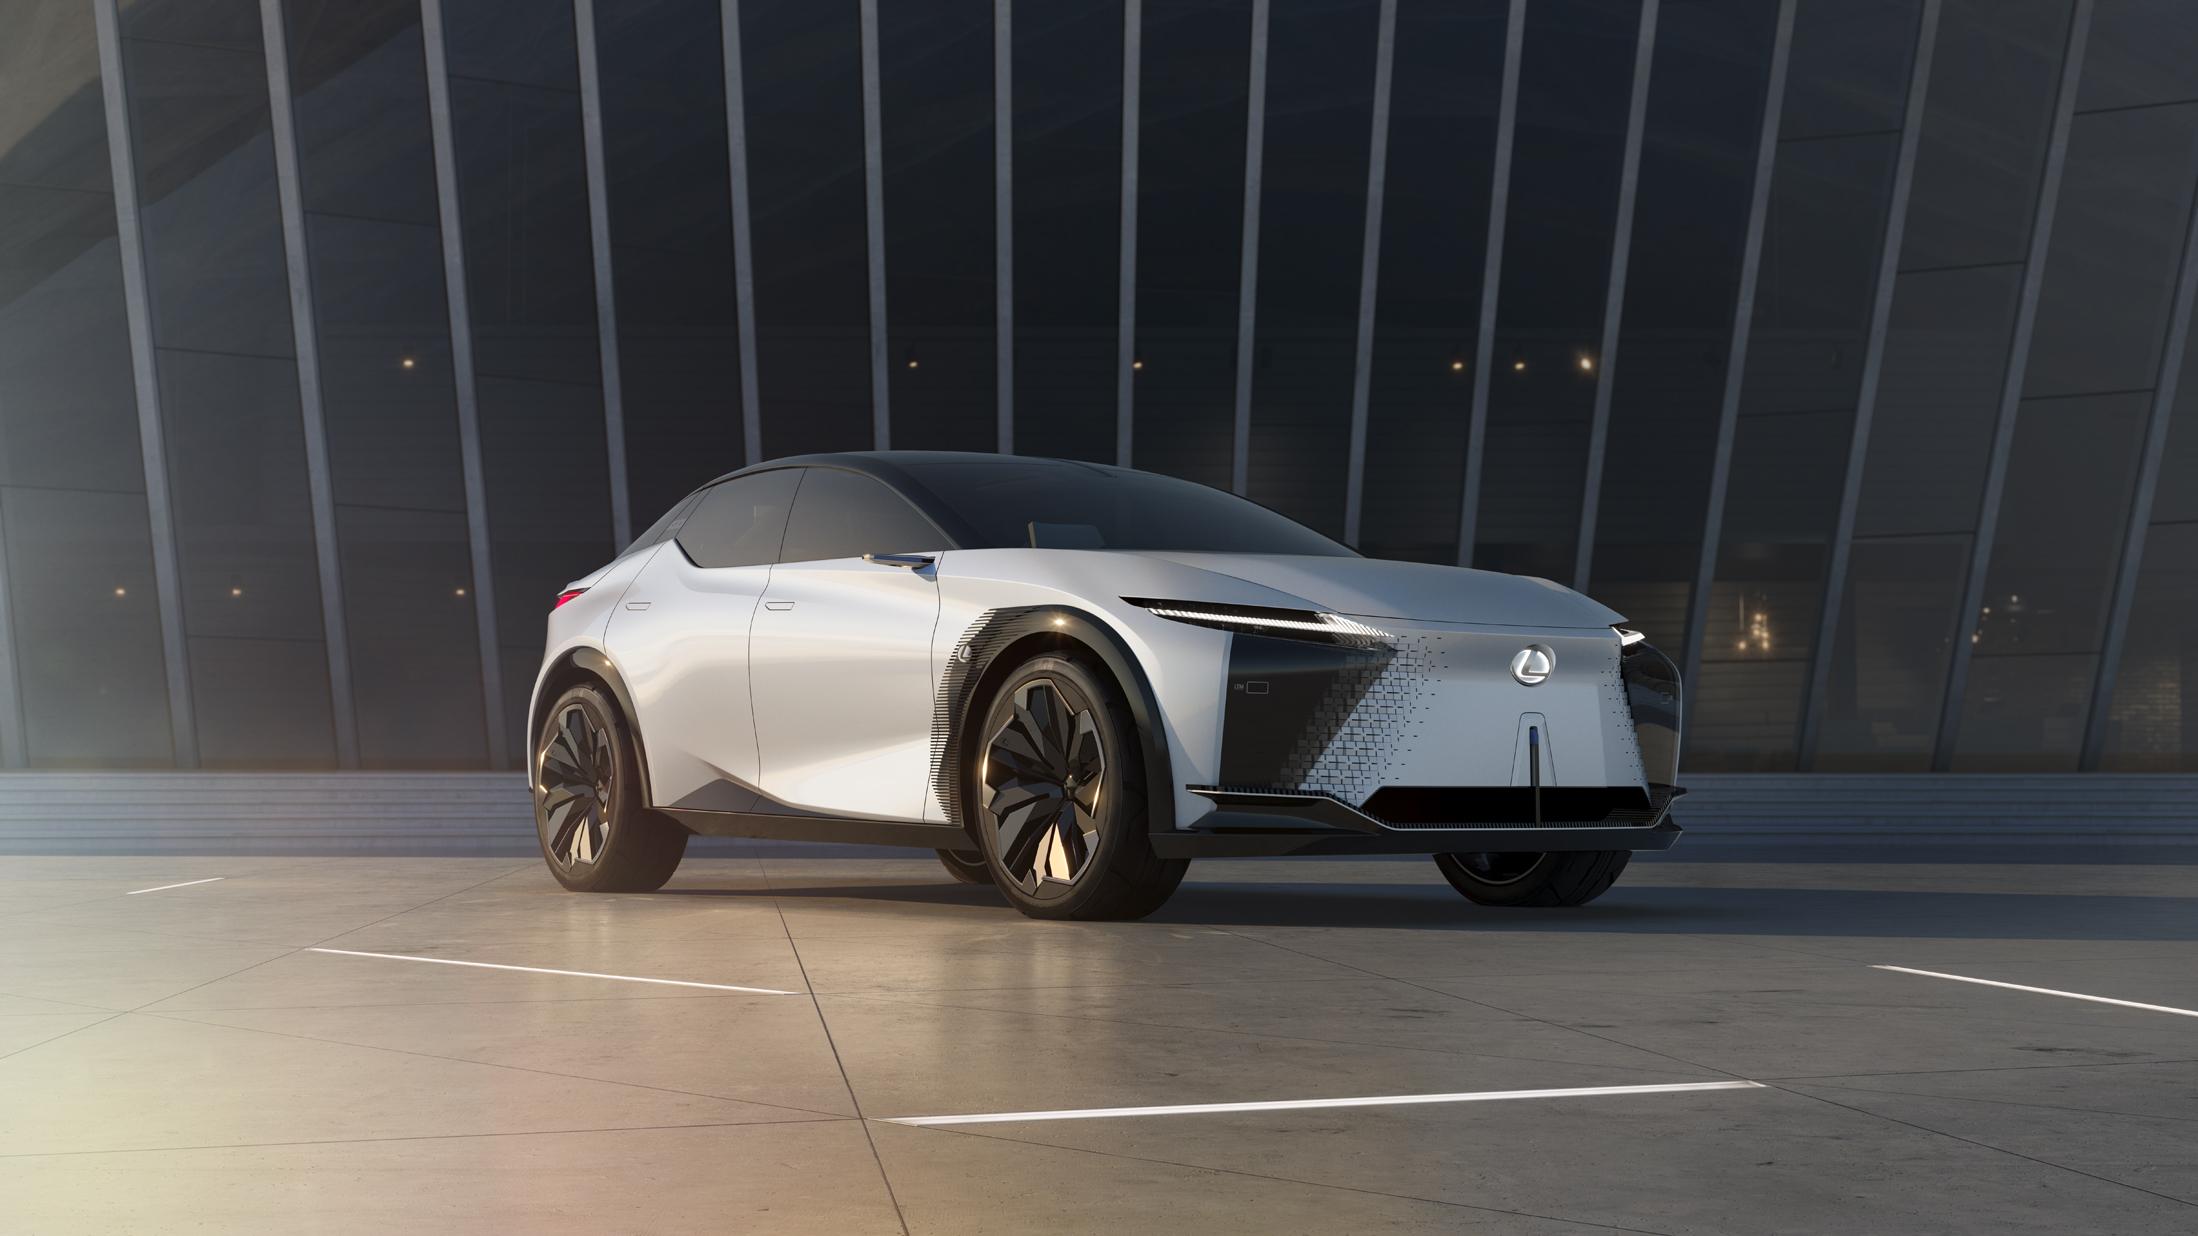 Car industry rapidly heading towards electrification